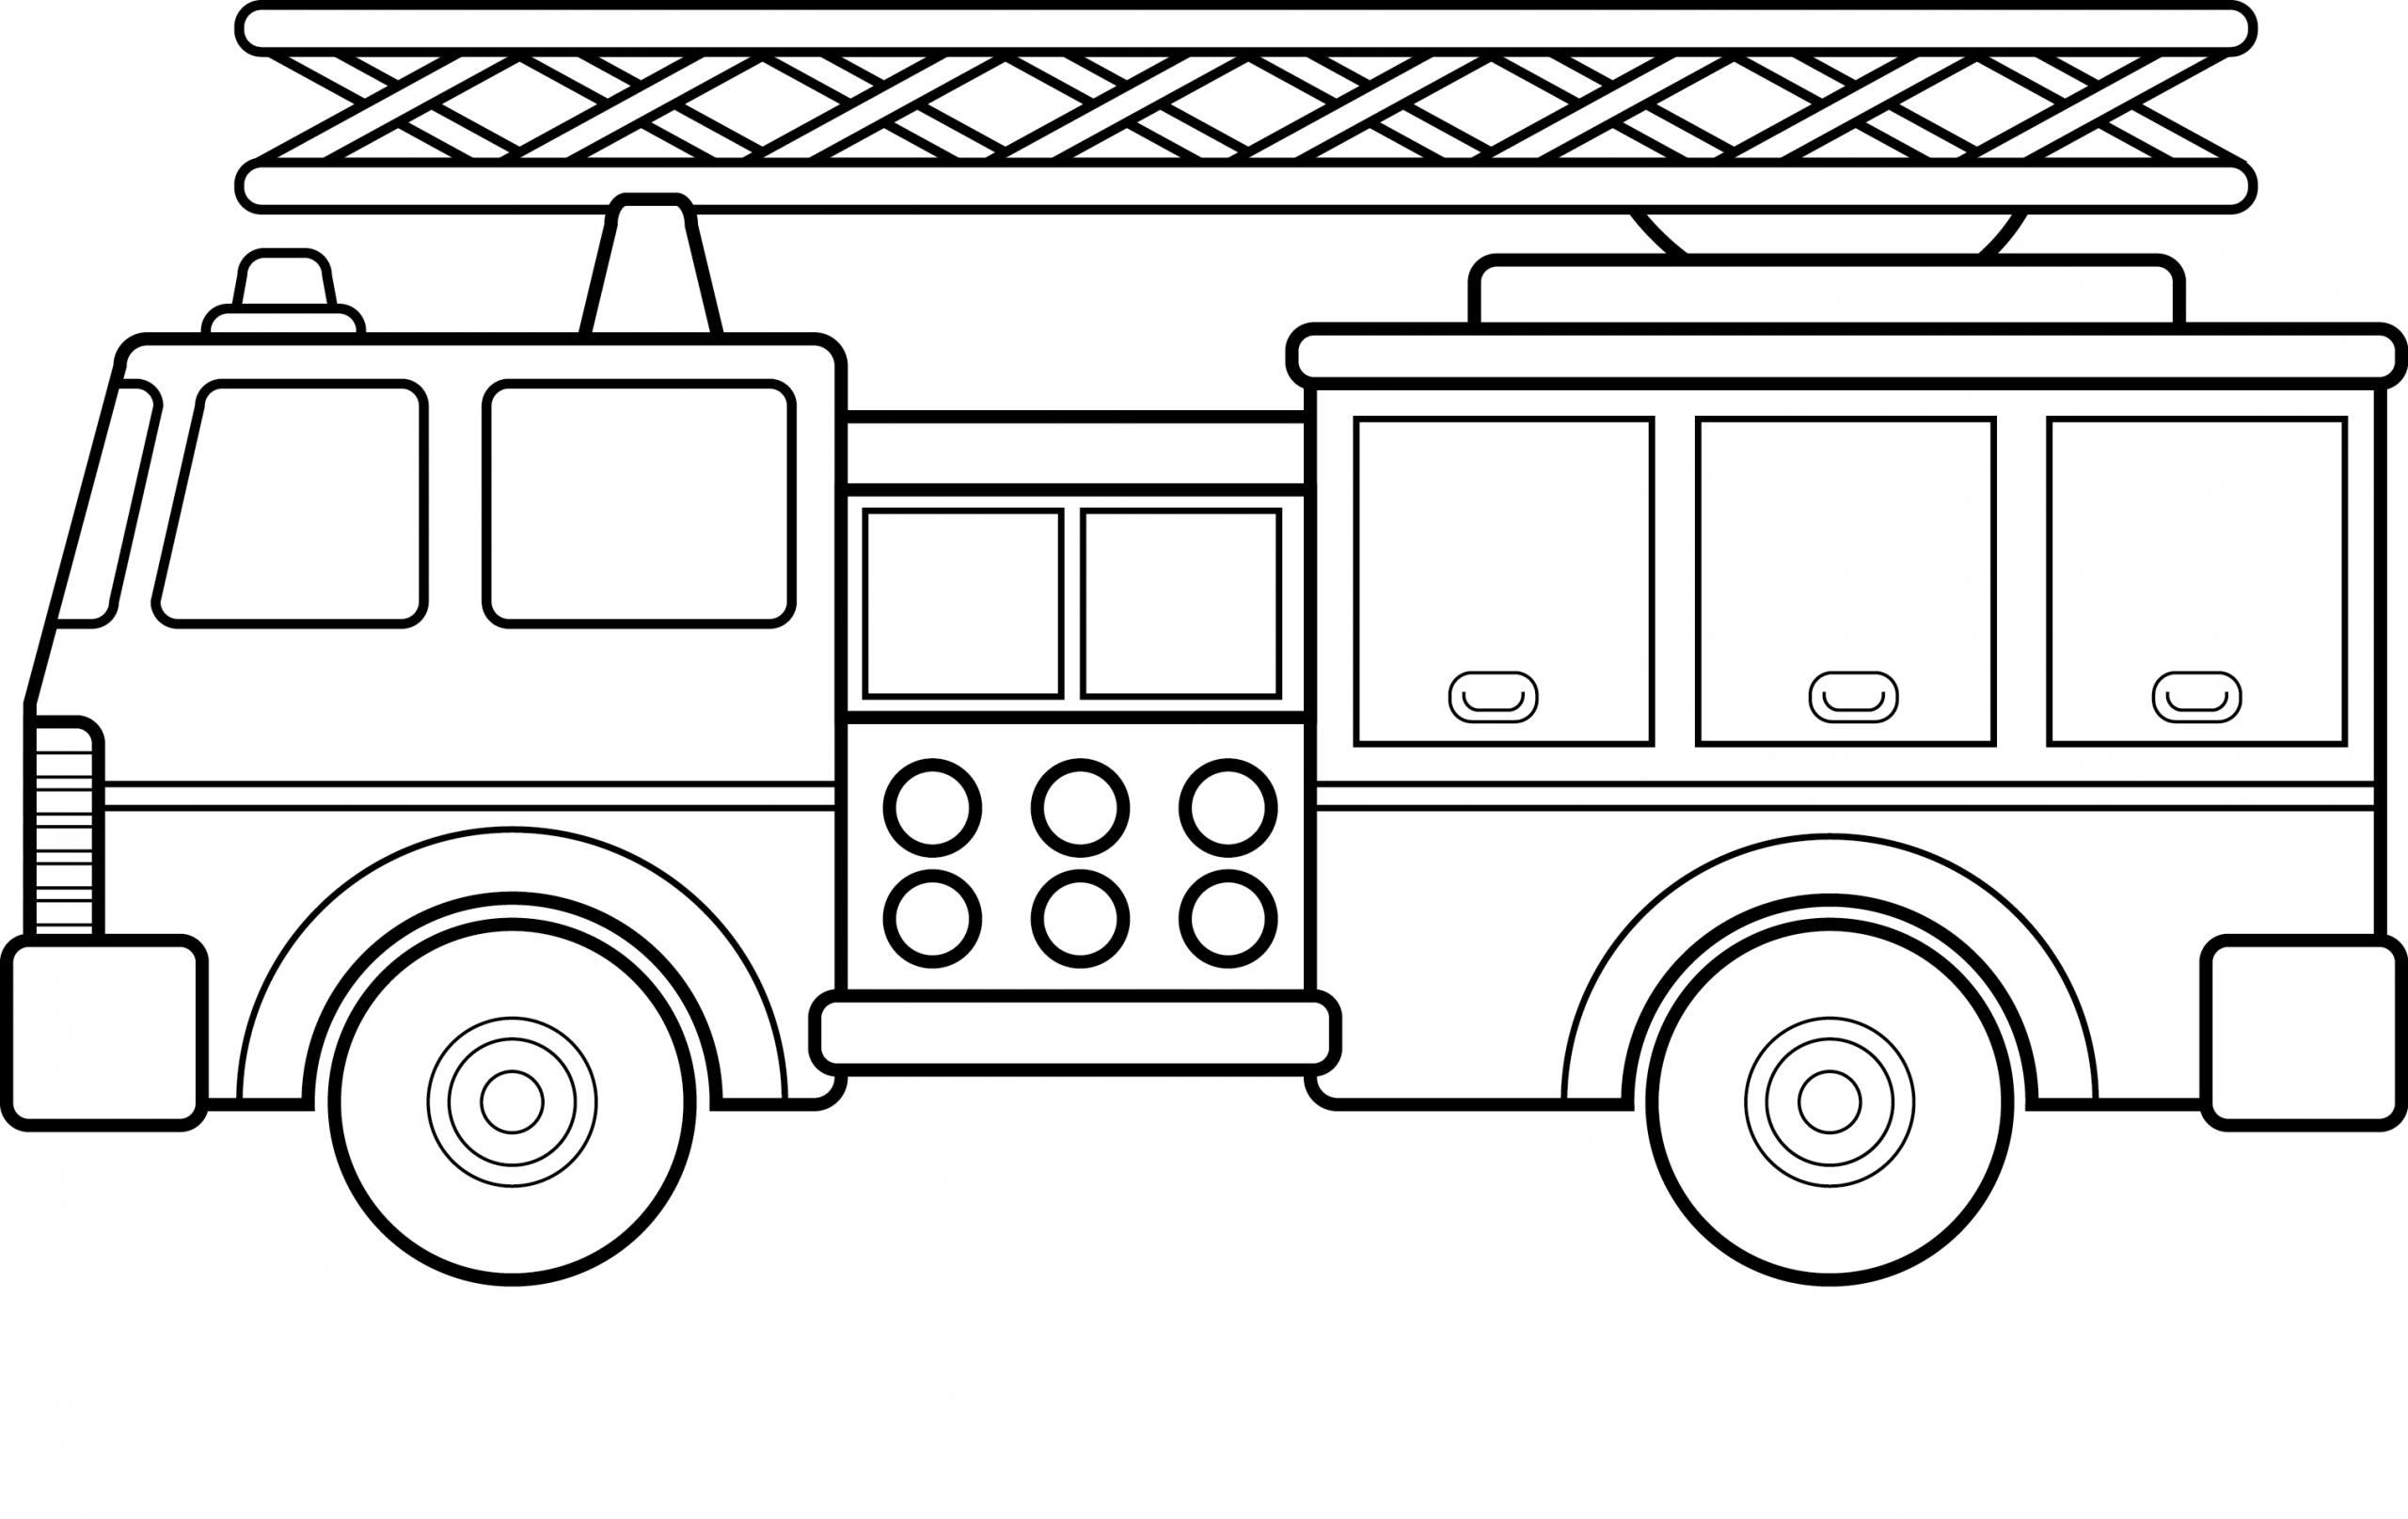 Free Printable Fire Truck Coloring Pages For Kids (Mit bei Feuerwehrauto Zum Ausmalen